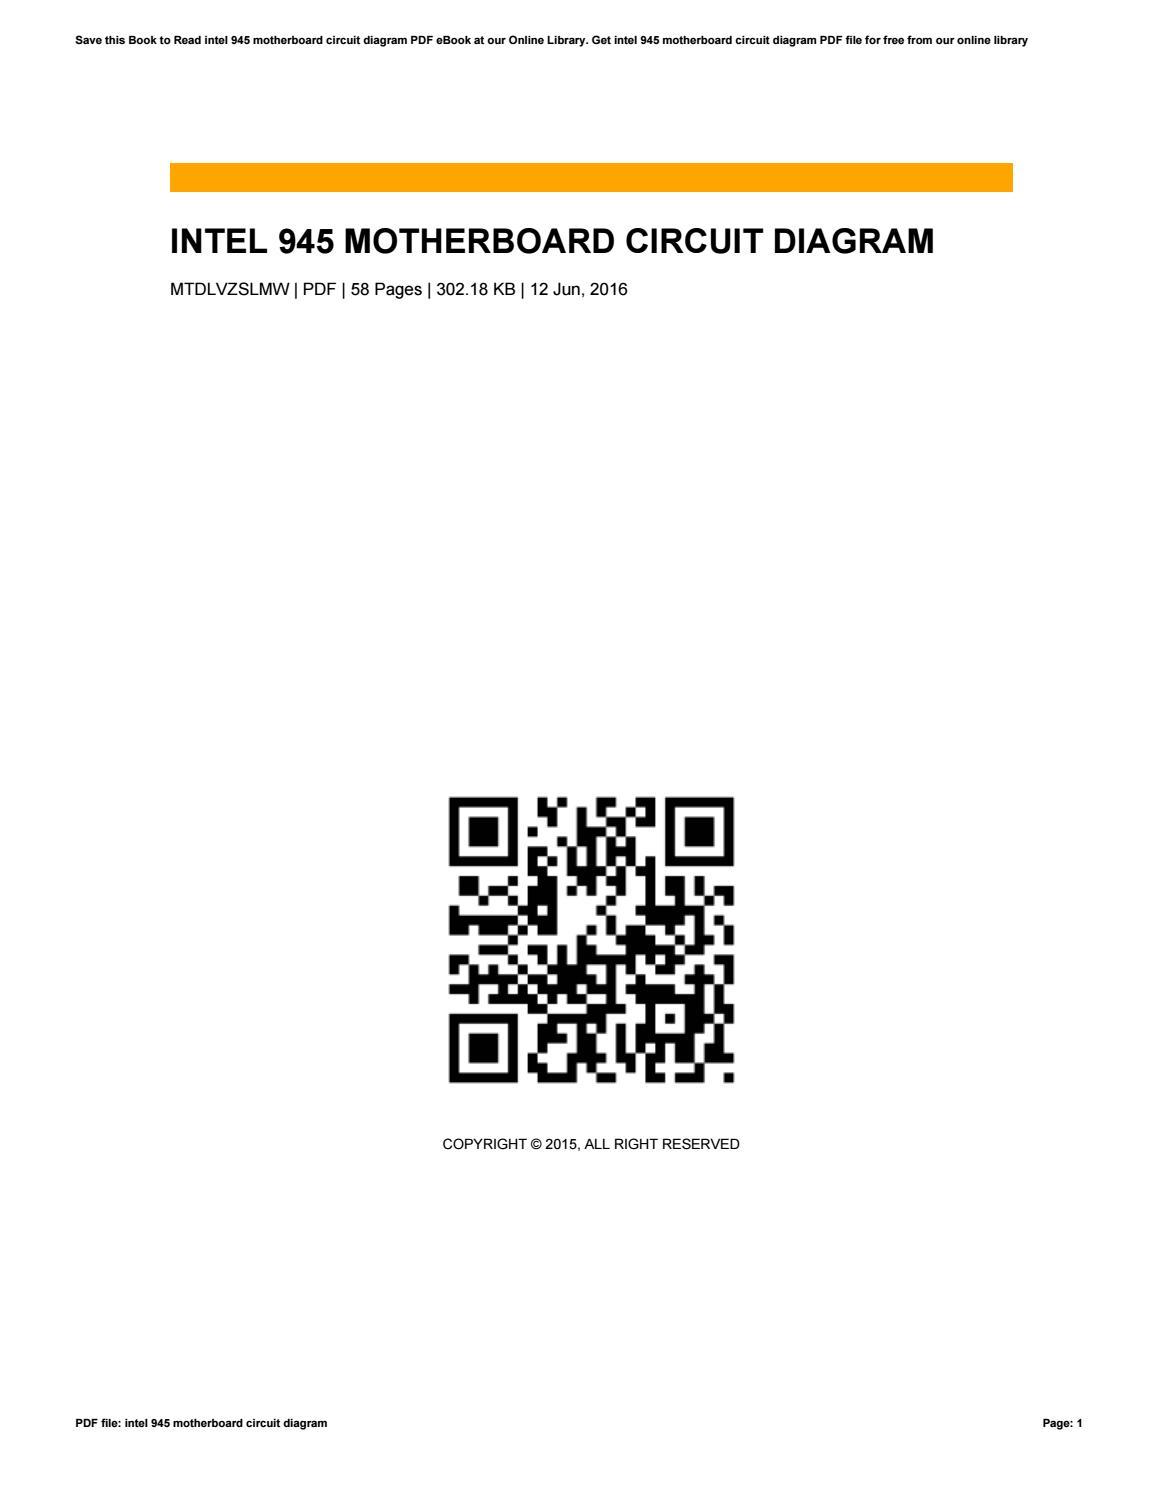 Circuit Diagram Of Intel 945 Motherboard | Wiring Diagram